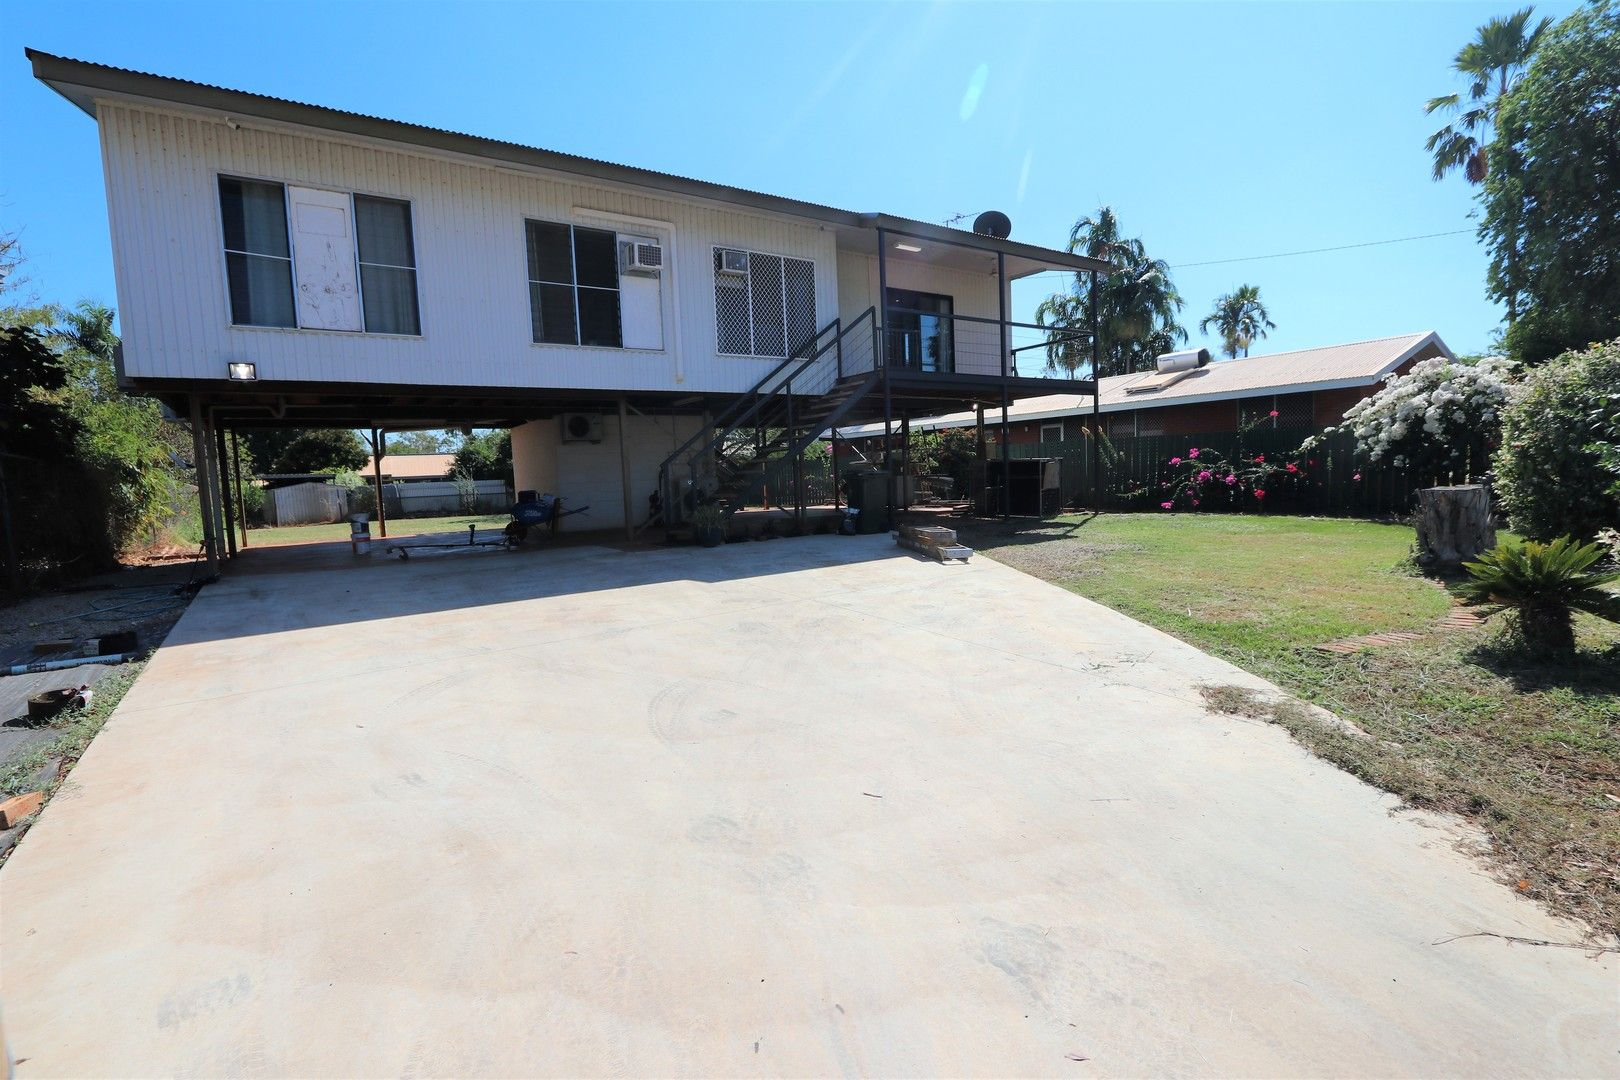 4 bedrooms House in 67 Callistemon Drive KATHERINE NT, 0850